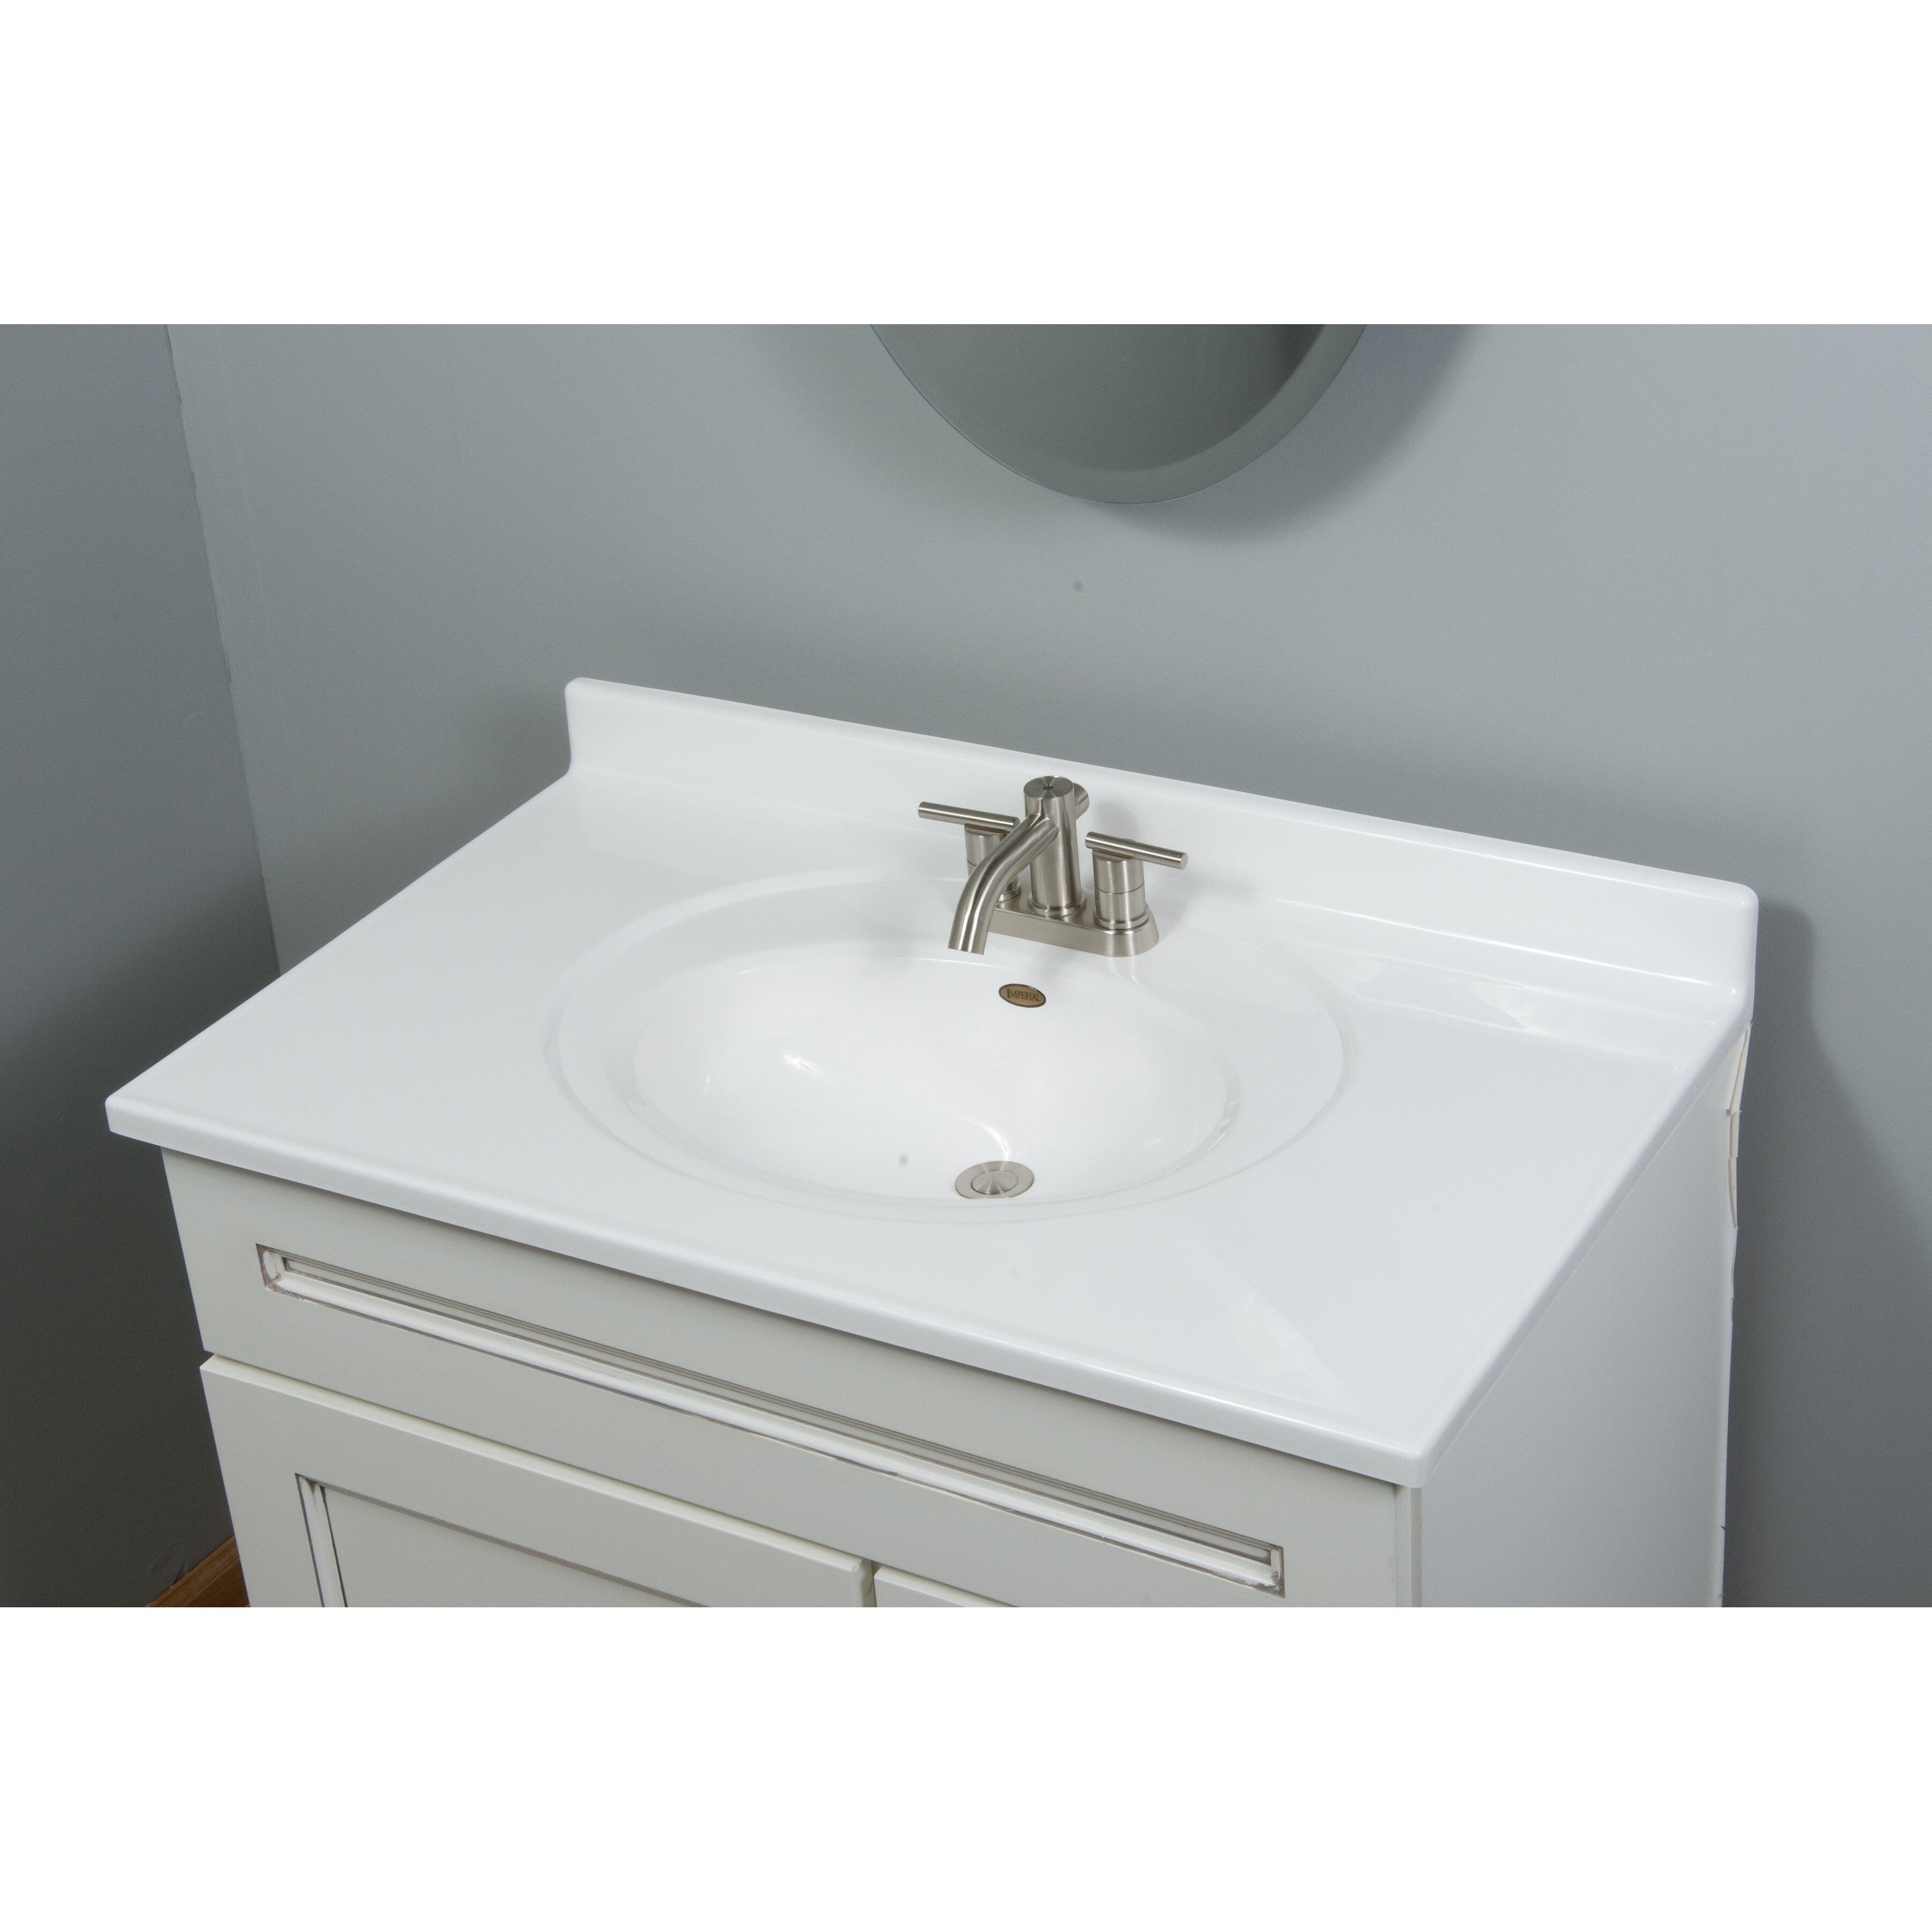 Imperial Recessed Center Oval 37 Single Bathroom Vanity Top Revie